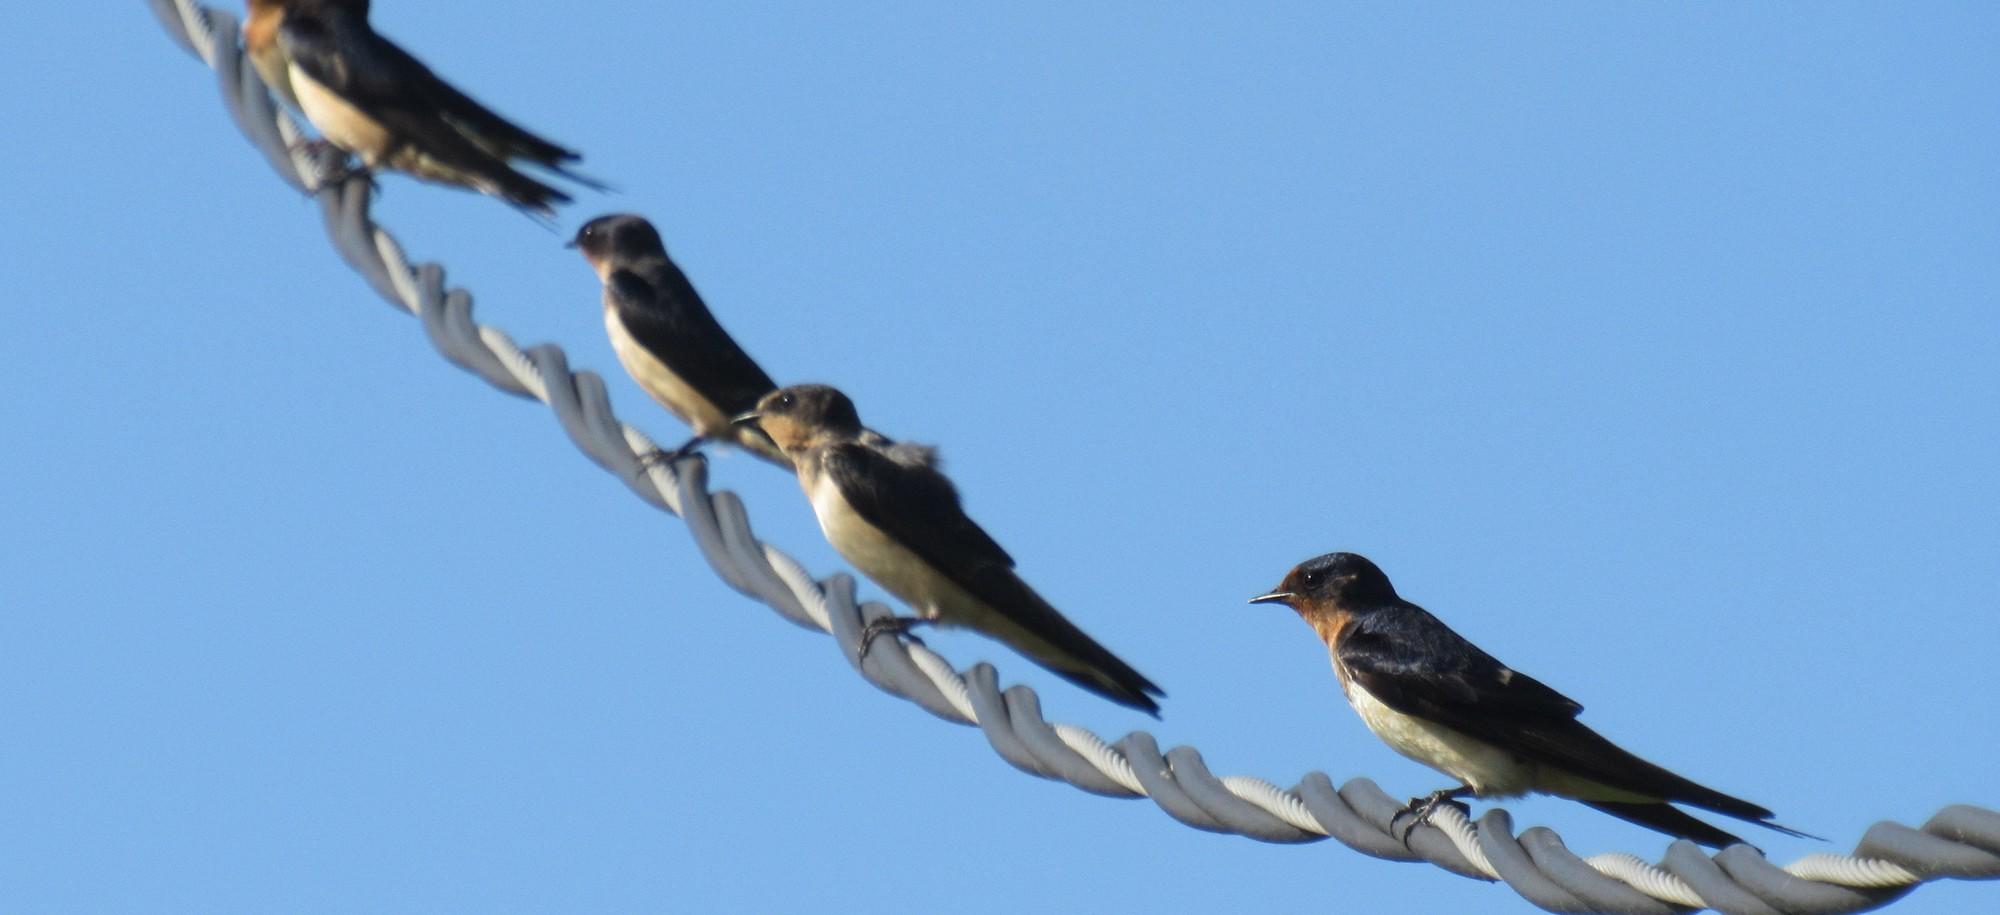 barn swallows on wire.jpg